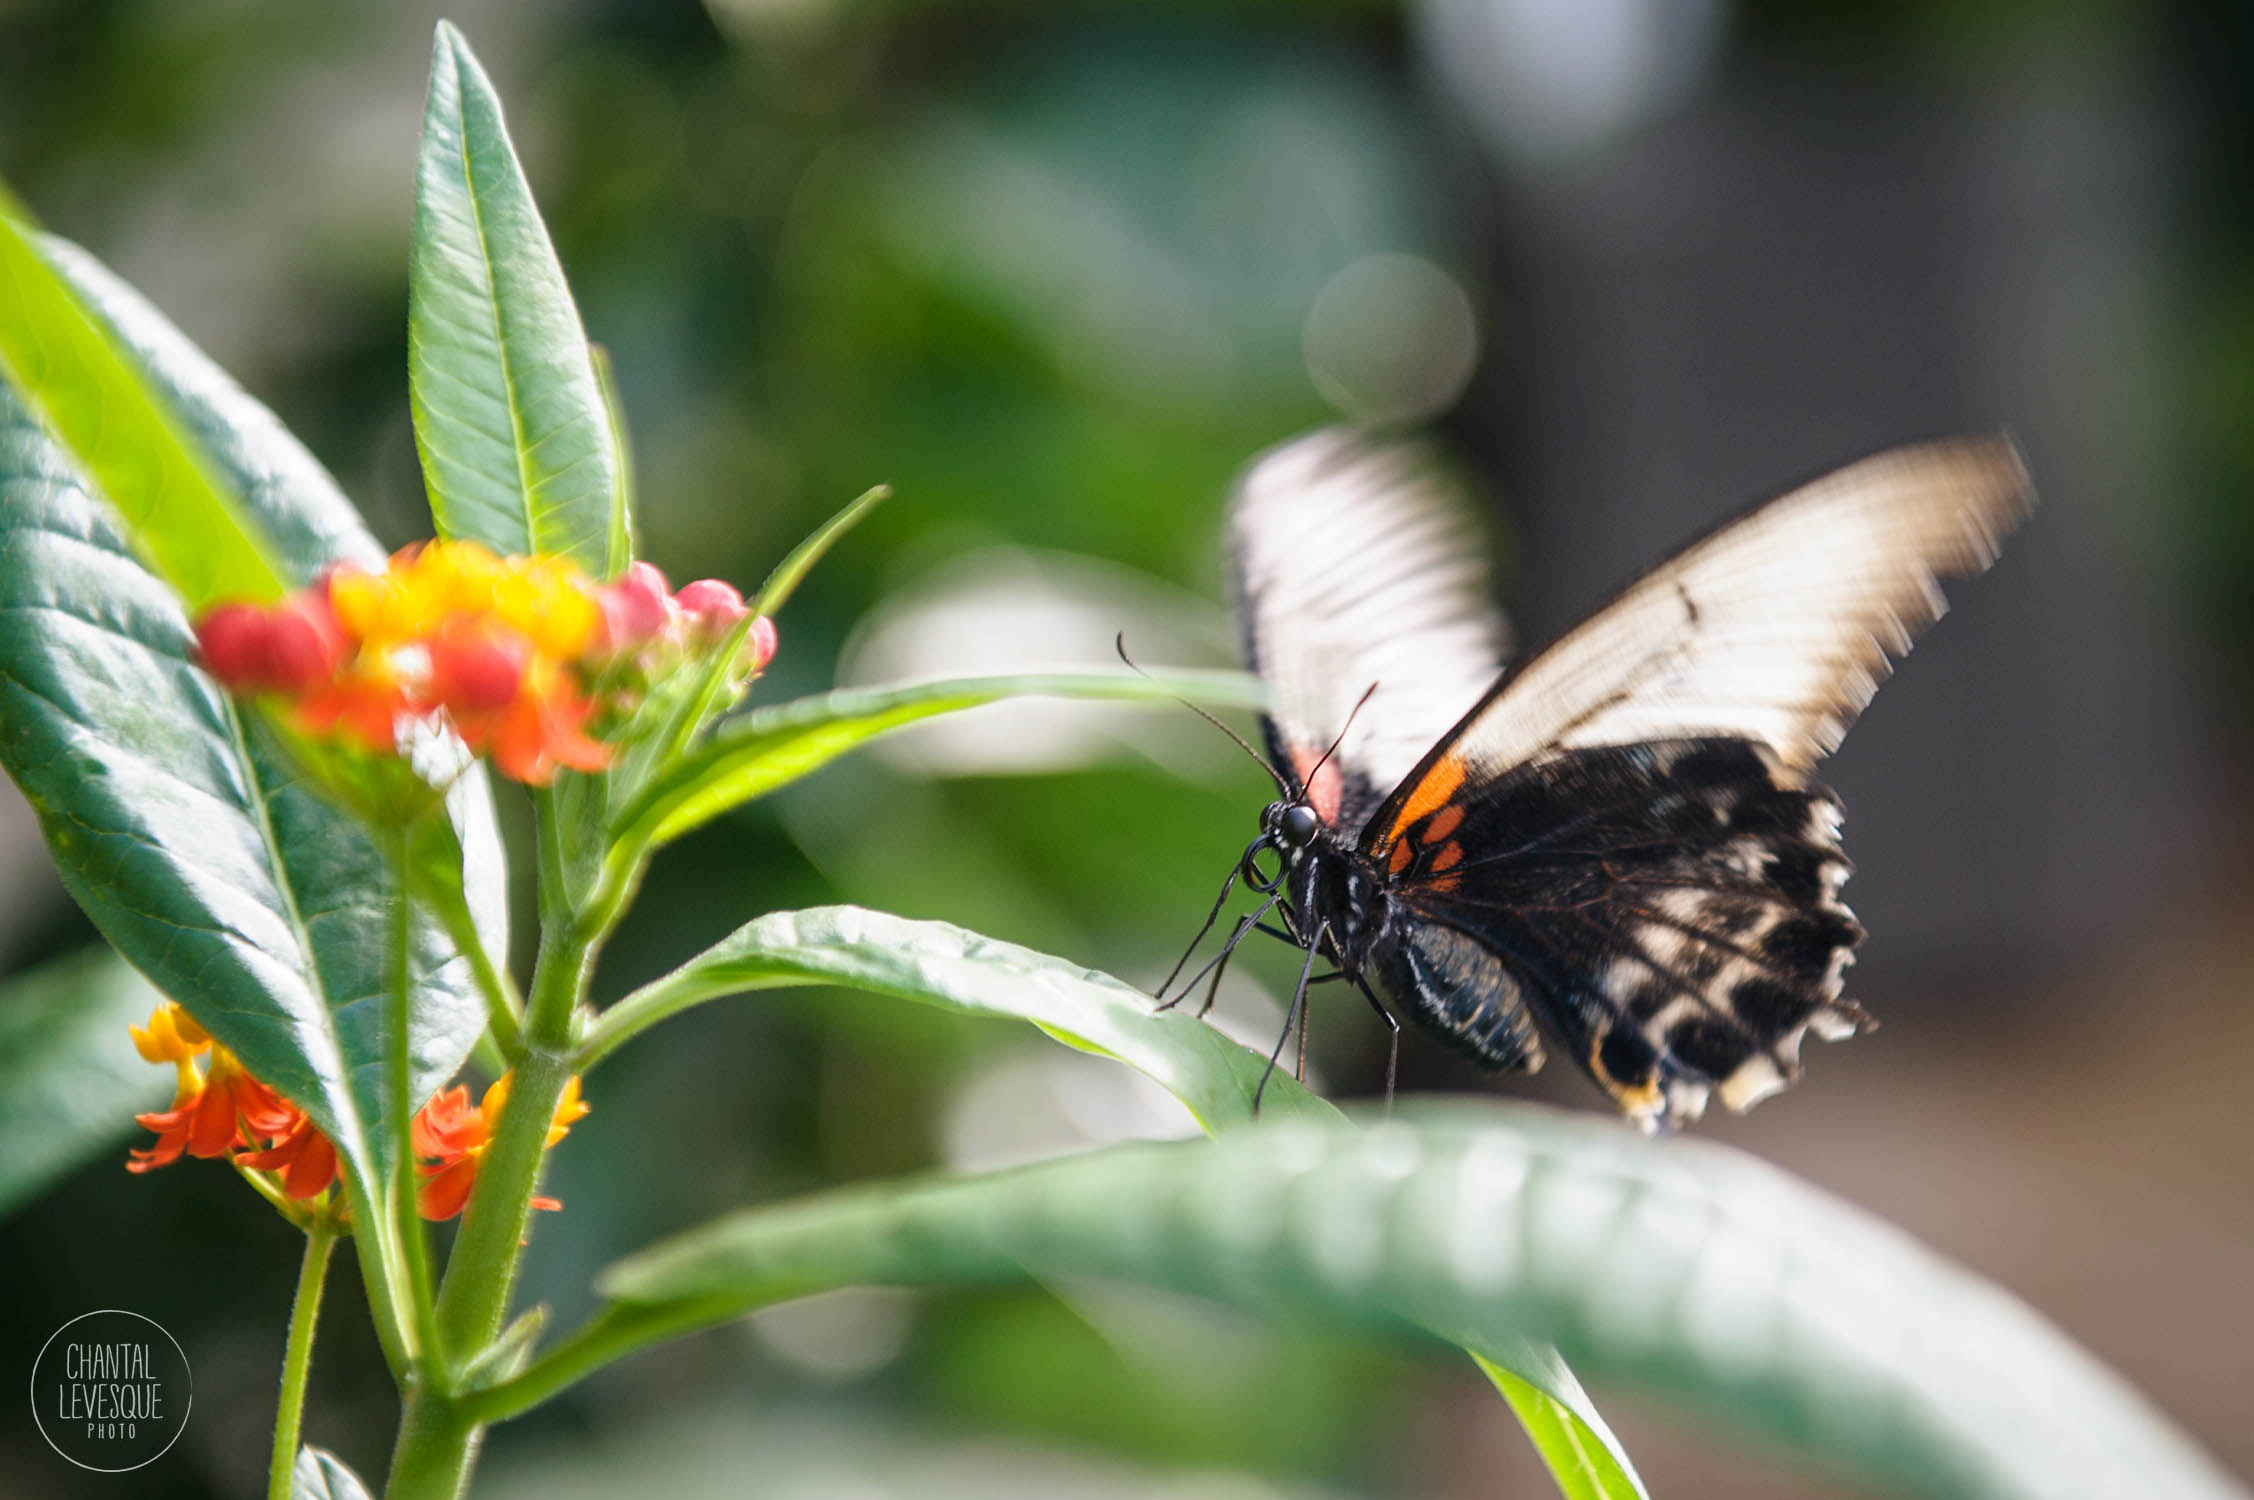 papillons-3495 copy.jpg